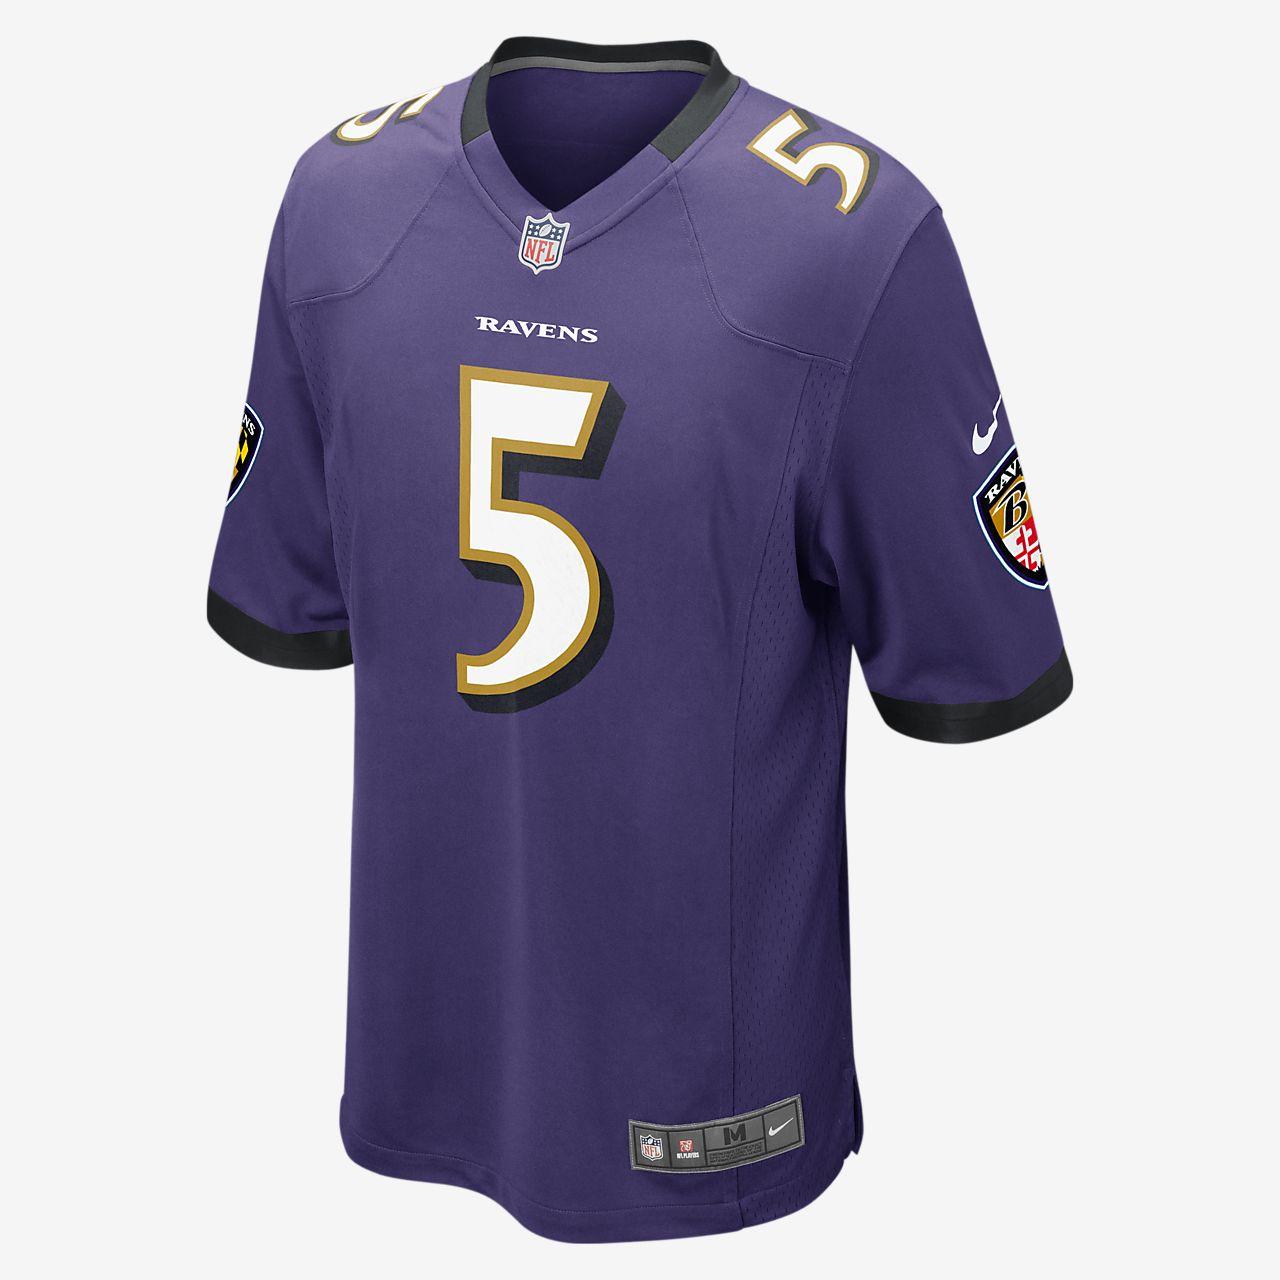 NFL Baltimore Ravens (Joe Flacco) férfi hazai amerikaifutball-mérkőzésmez